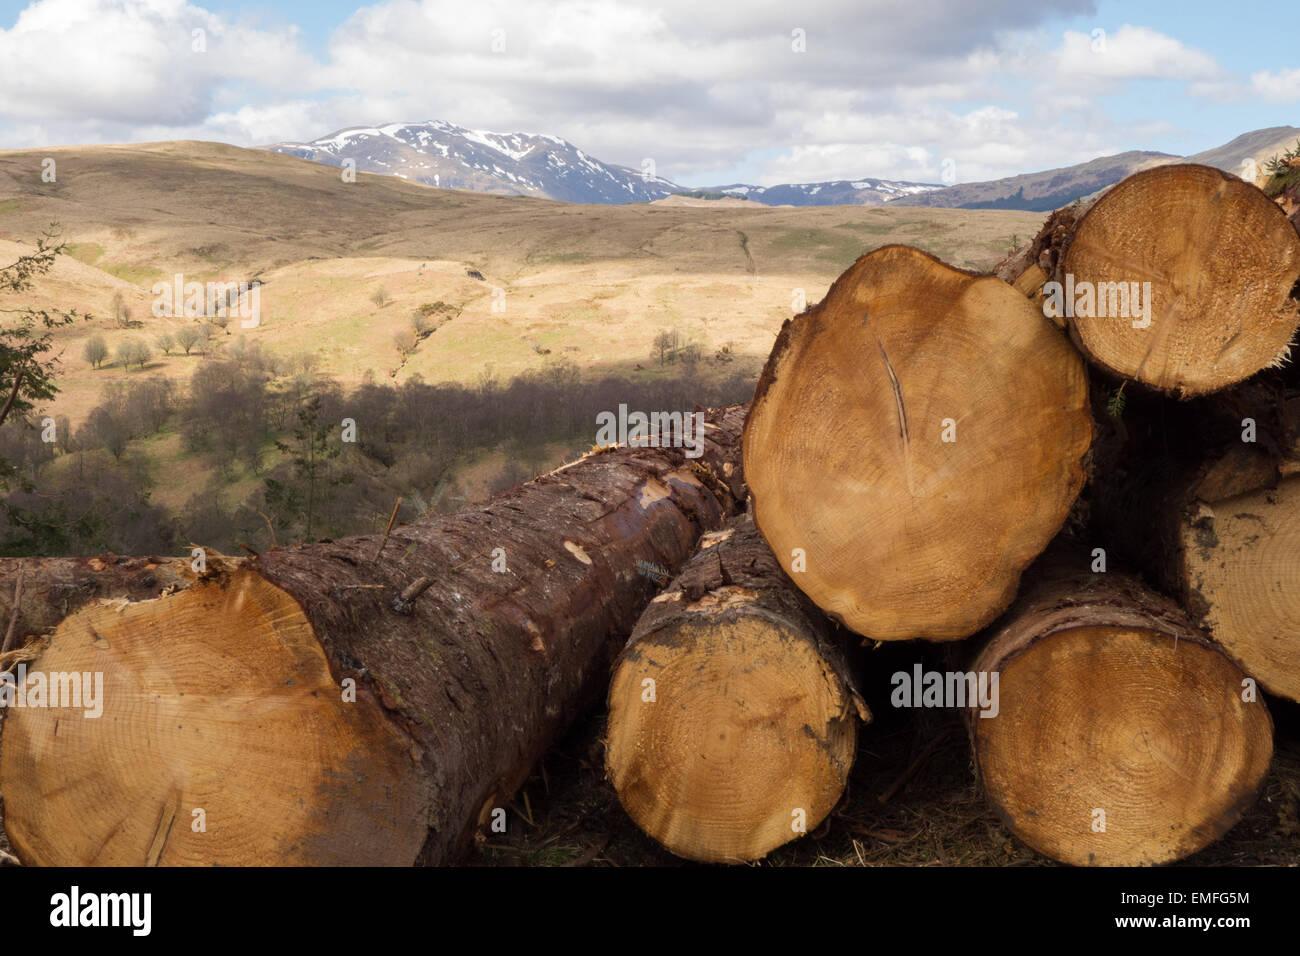 Freshly felled logs - Callander, Scotland, UK - Stock Image